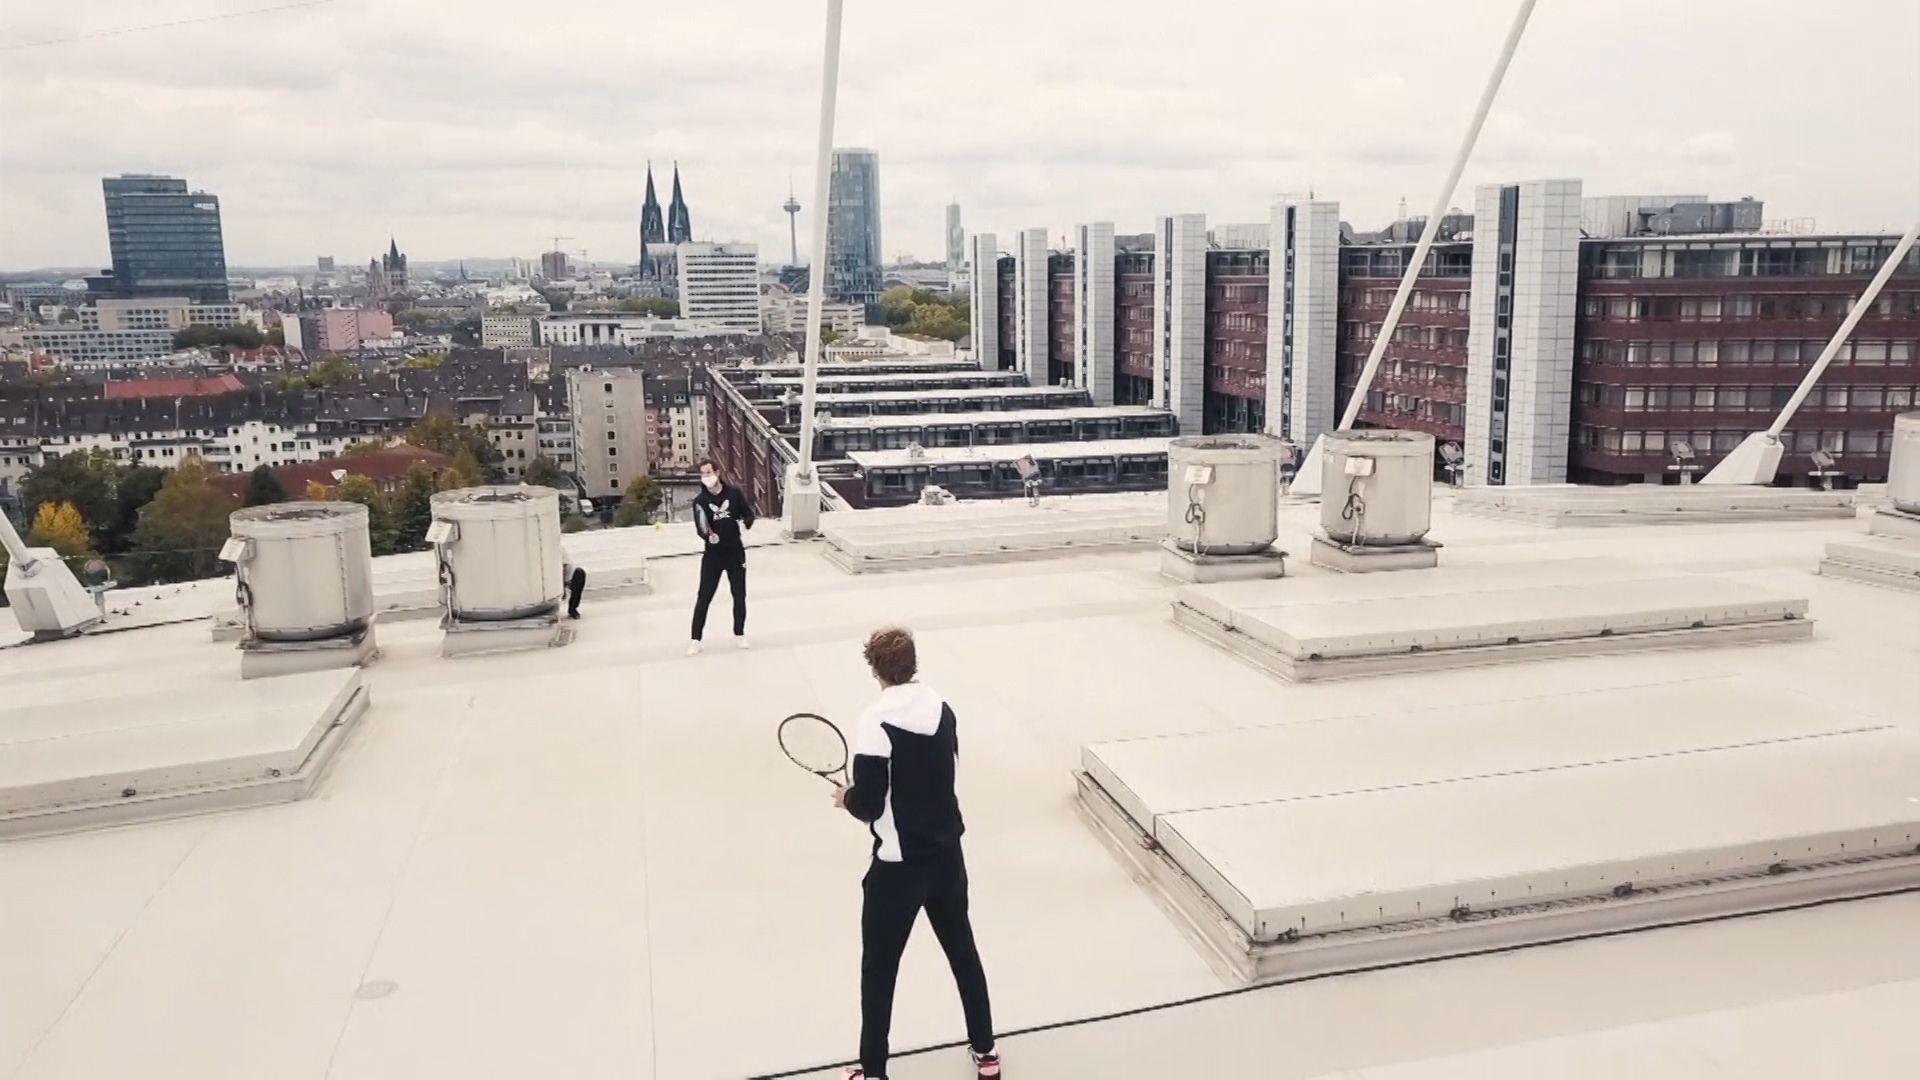 Murray, Zverev play stadium rooftop tennis